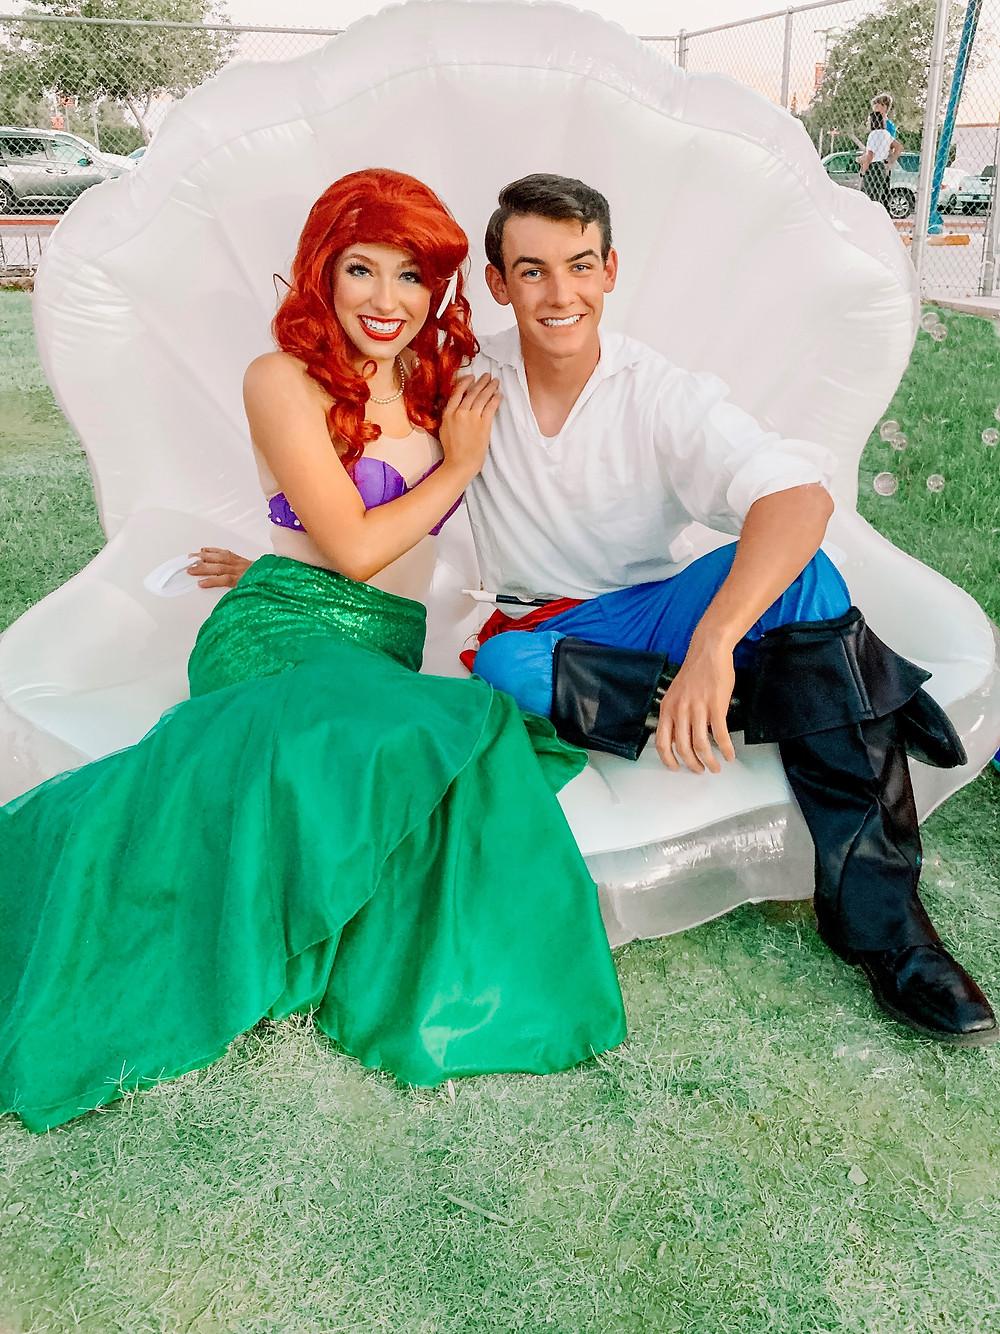 Princess, Ariel, Prince Eric, Mermaid, sea shell